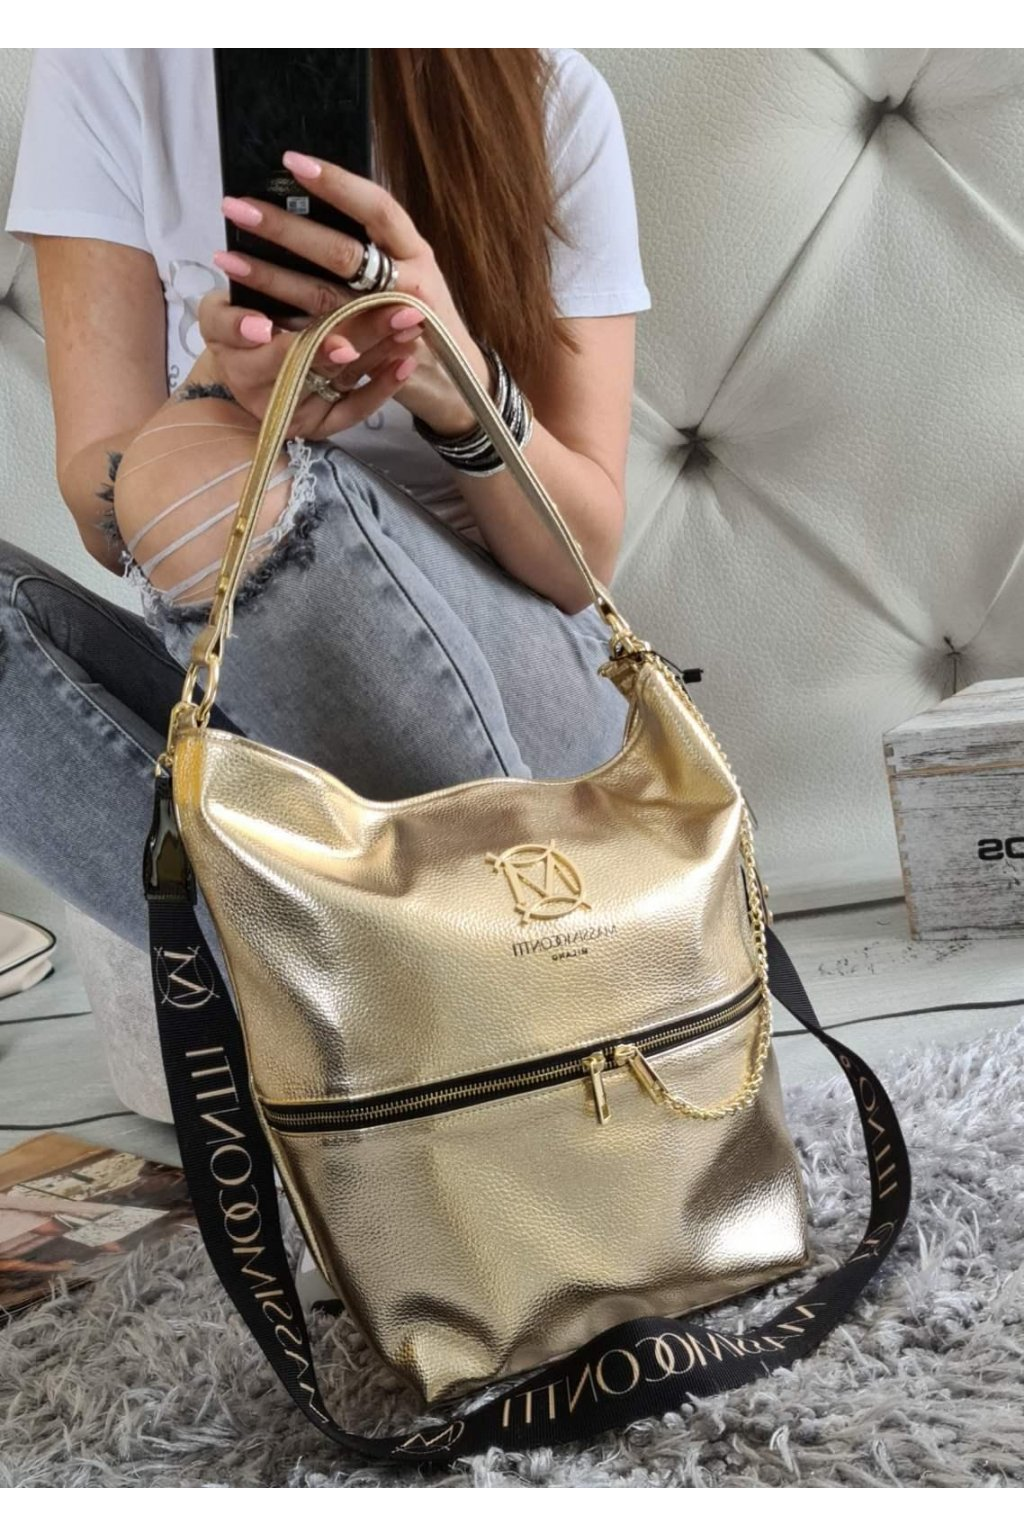 MASSIMO CONTTI italy style kabelka trendy gold zlatá eko kůže syntetika